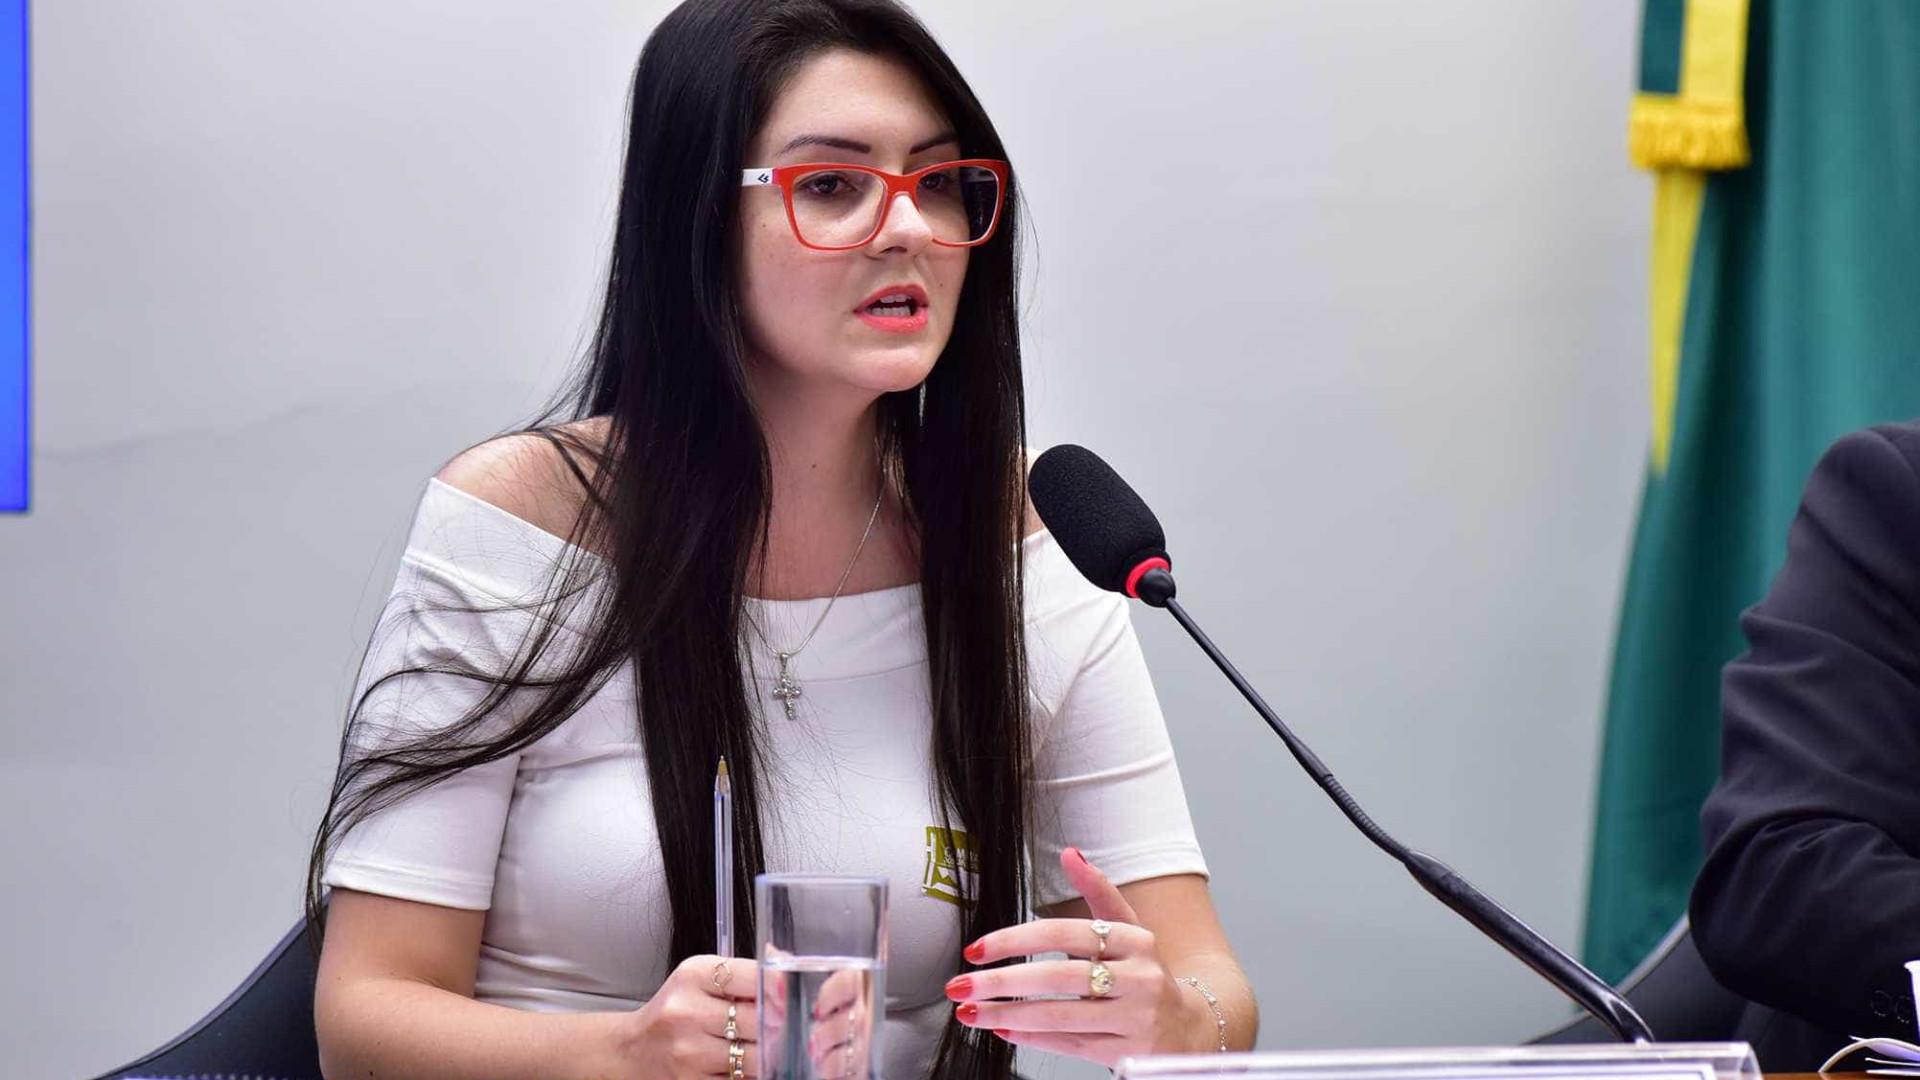 Ministério Público abre inquérito para inibir dedurismo nas escolas